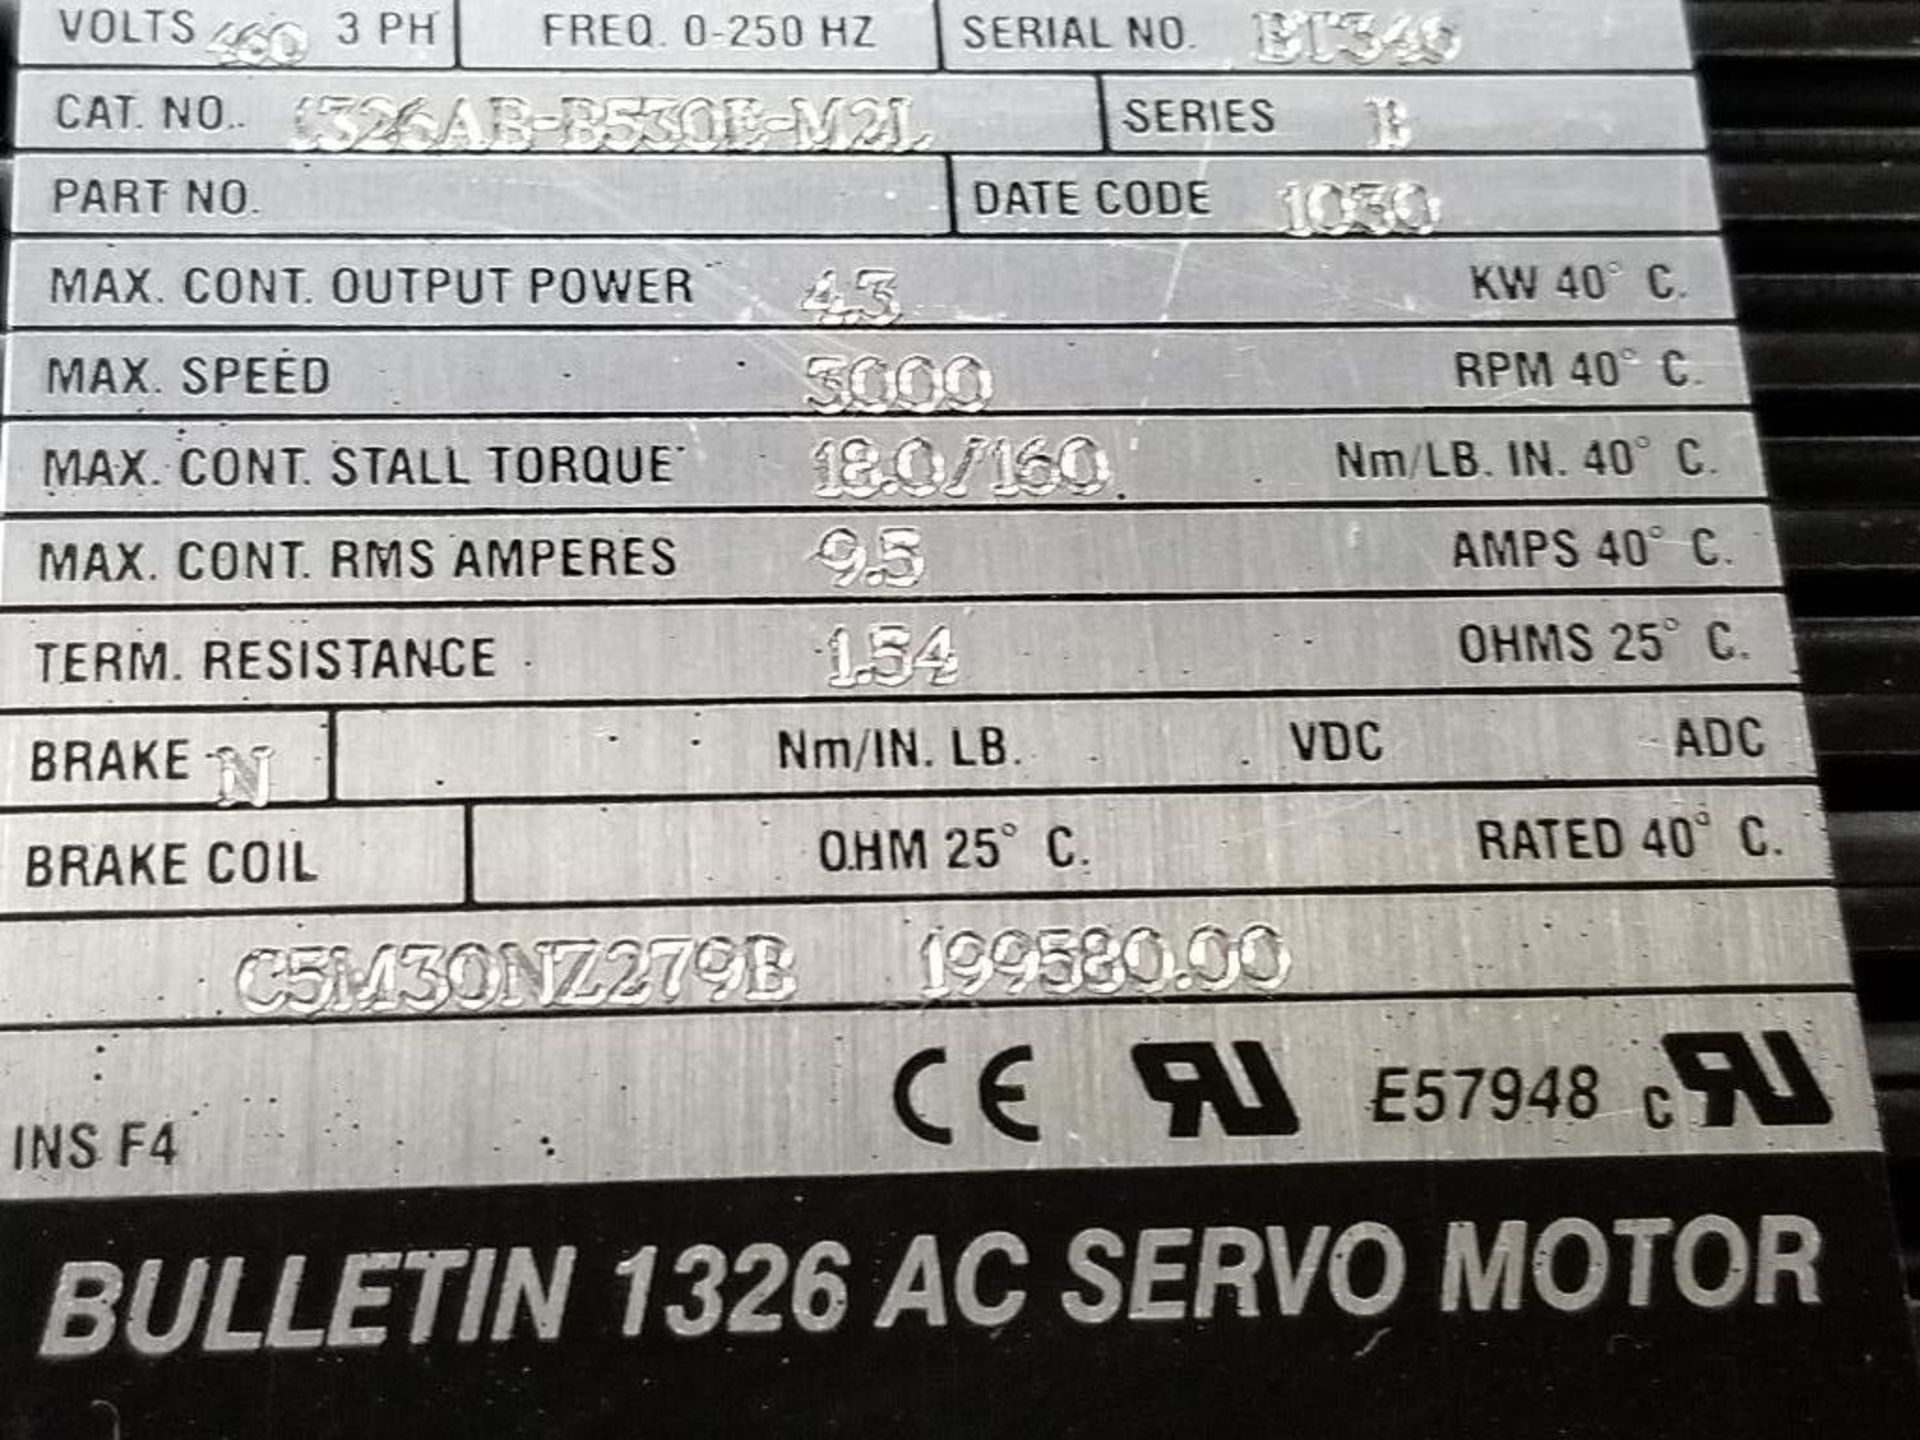 4.3kW Allen Bradley servo motor. 1326AB-B530E-M2L. 3PH, 460V, 3000RPM. - Image 4 of 4